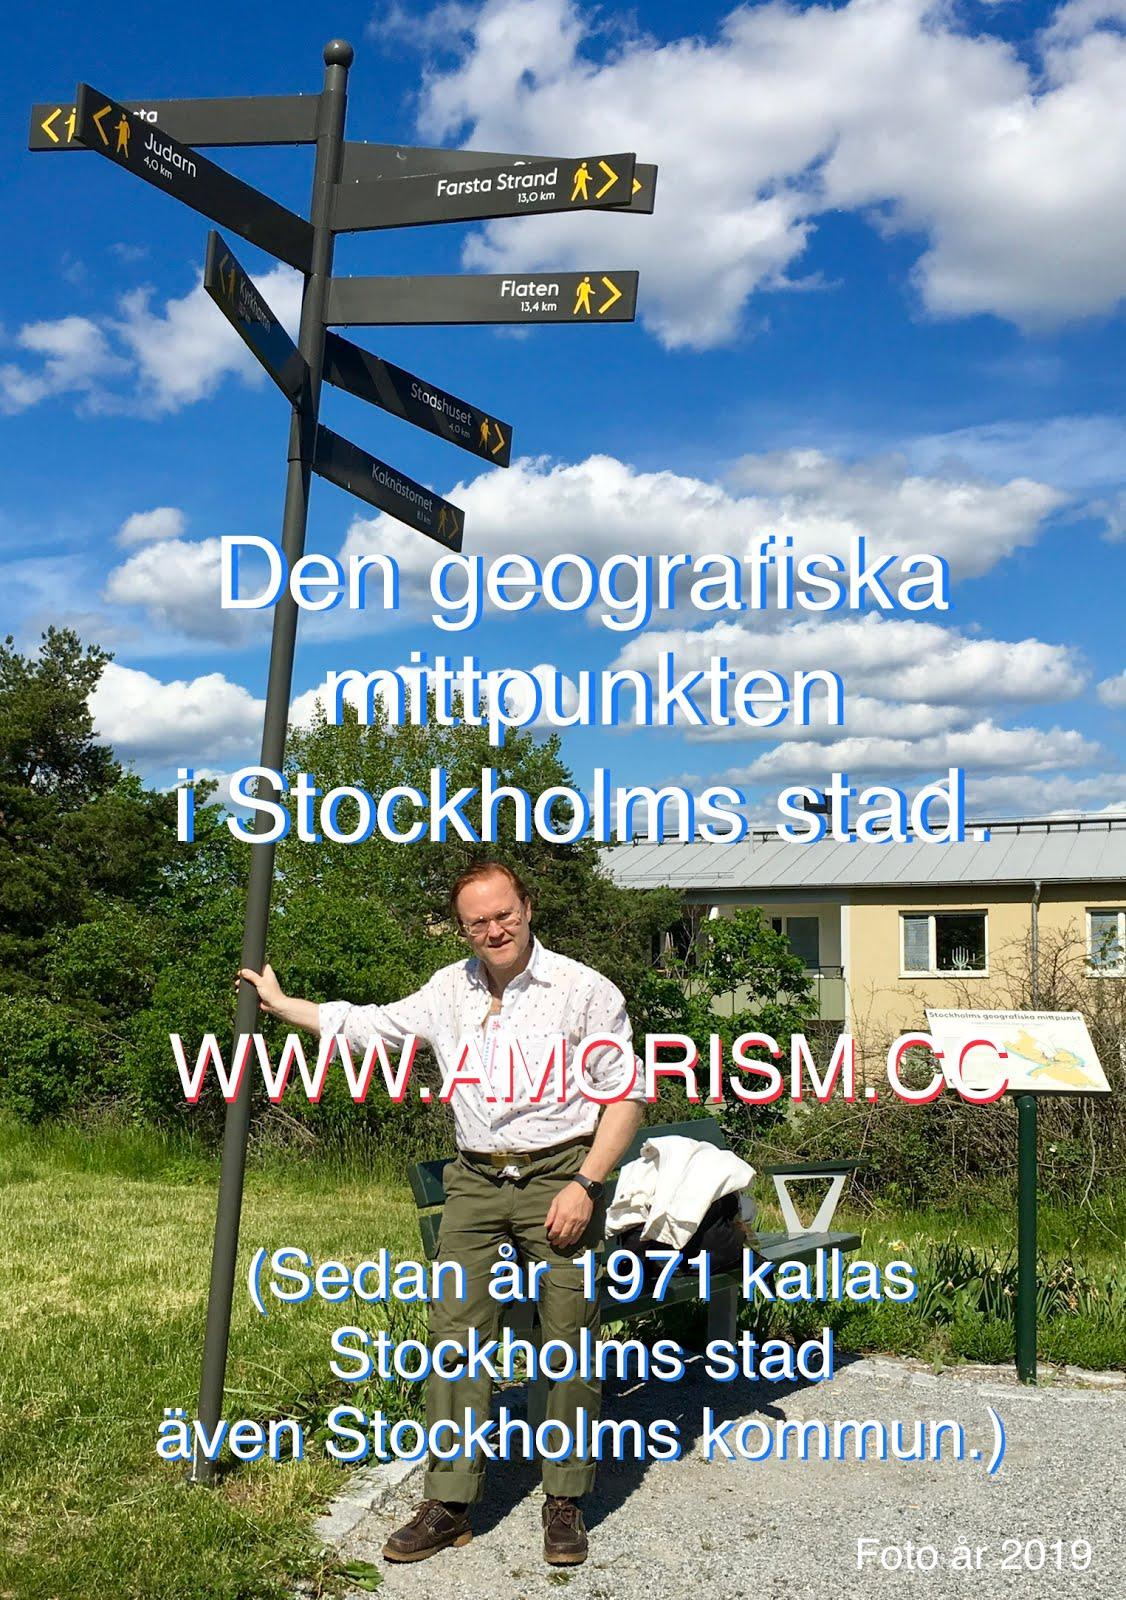 Jpg img. Stockholms geografiska mittpunkt